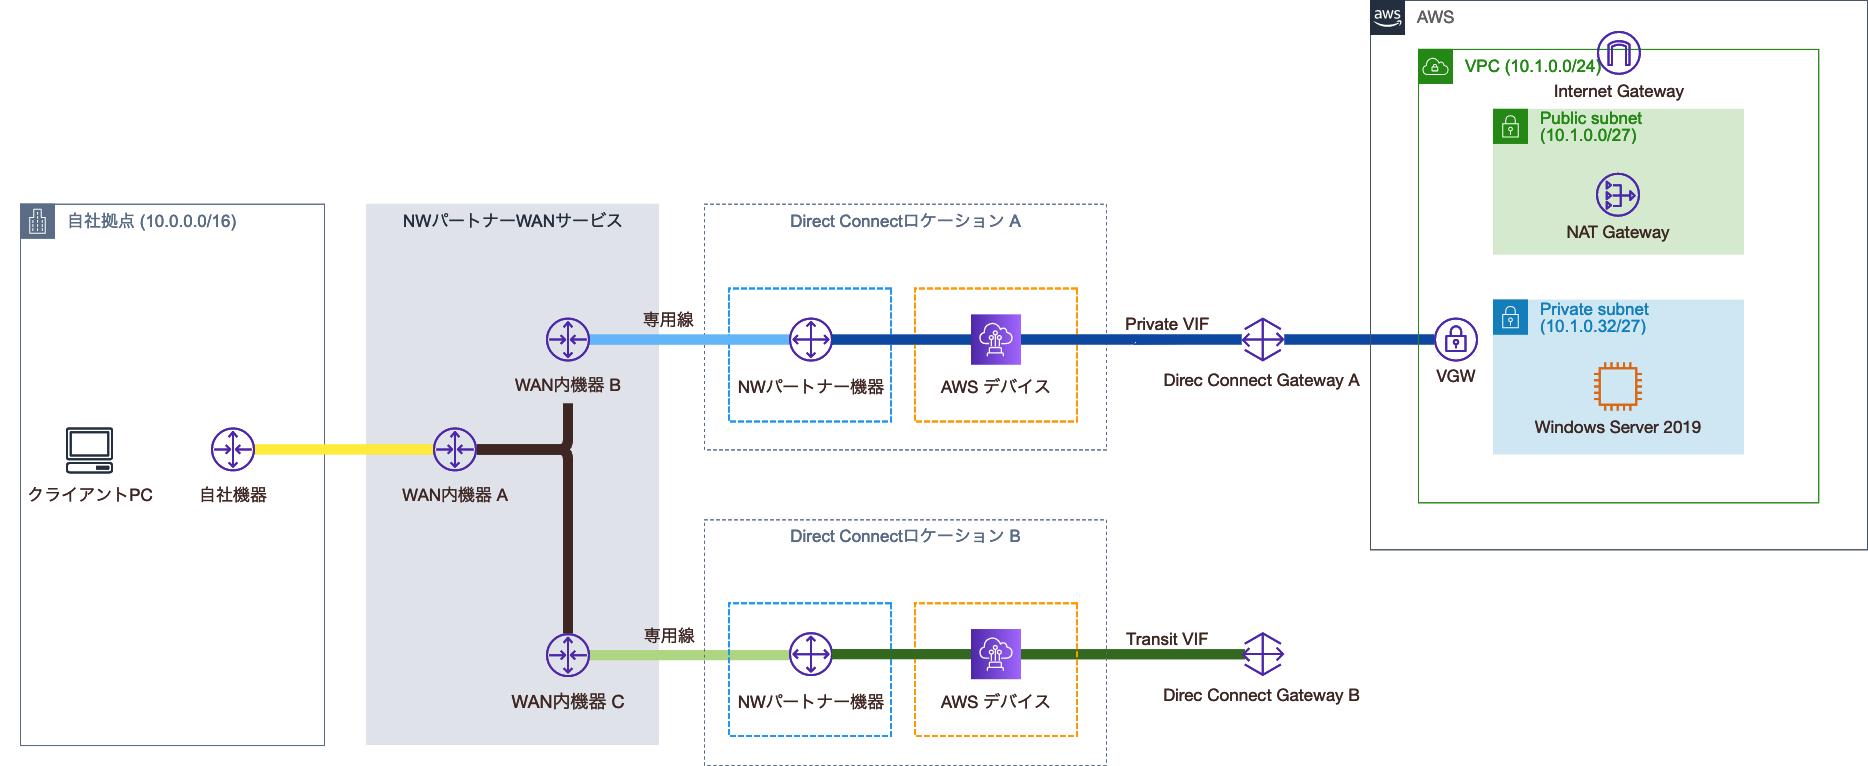 Transit VIF承諾後の構成図